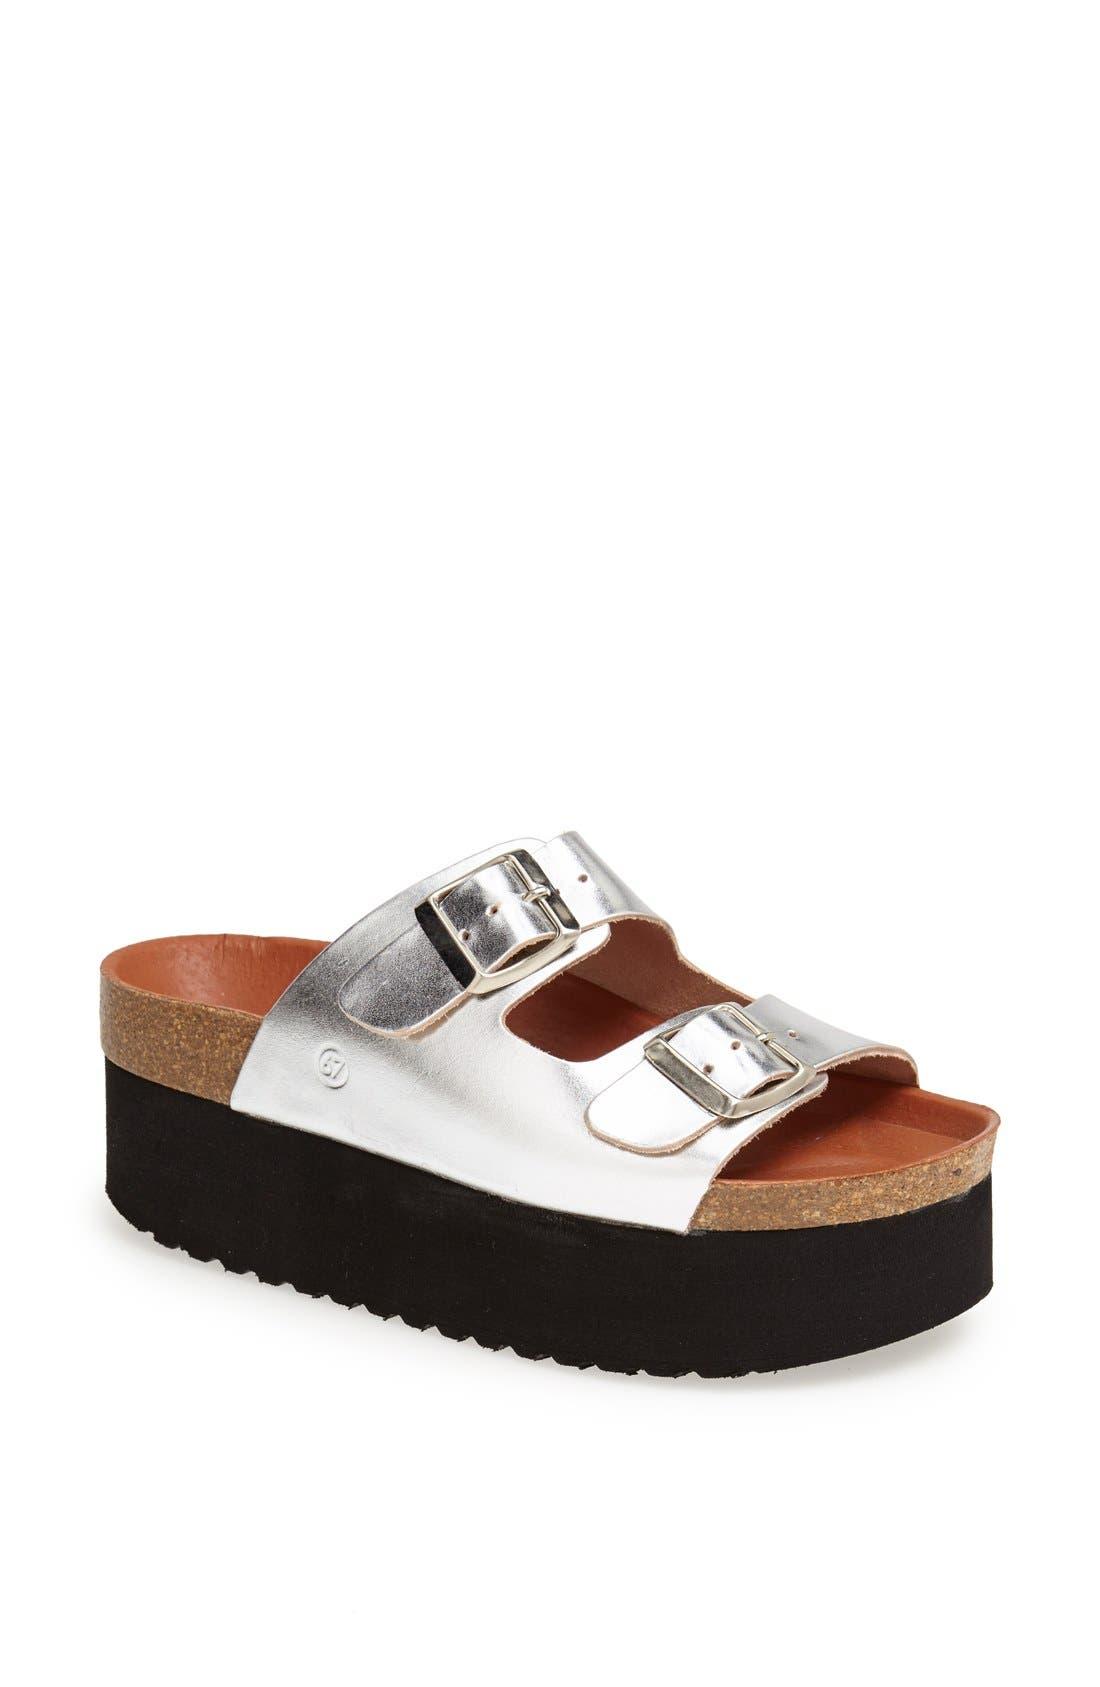 Alternate Image 1 Selected - SIXTYSEVEN 'Indigo' Sandal